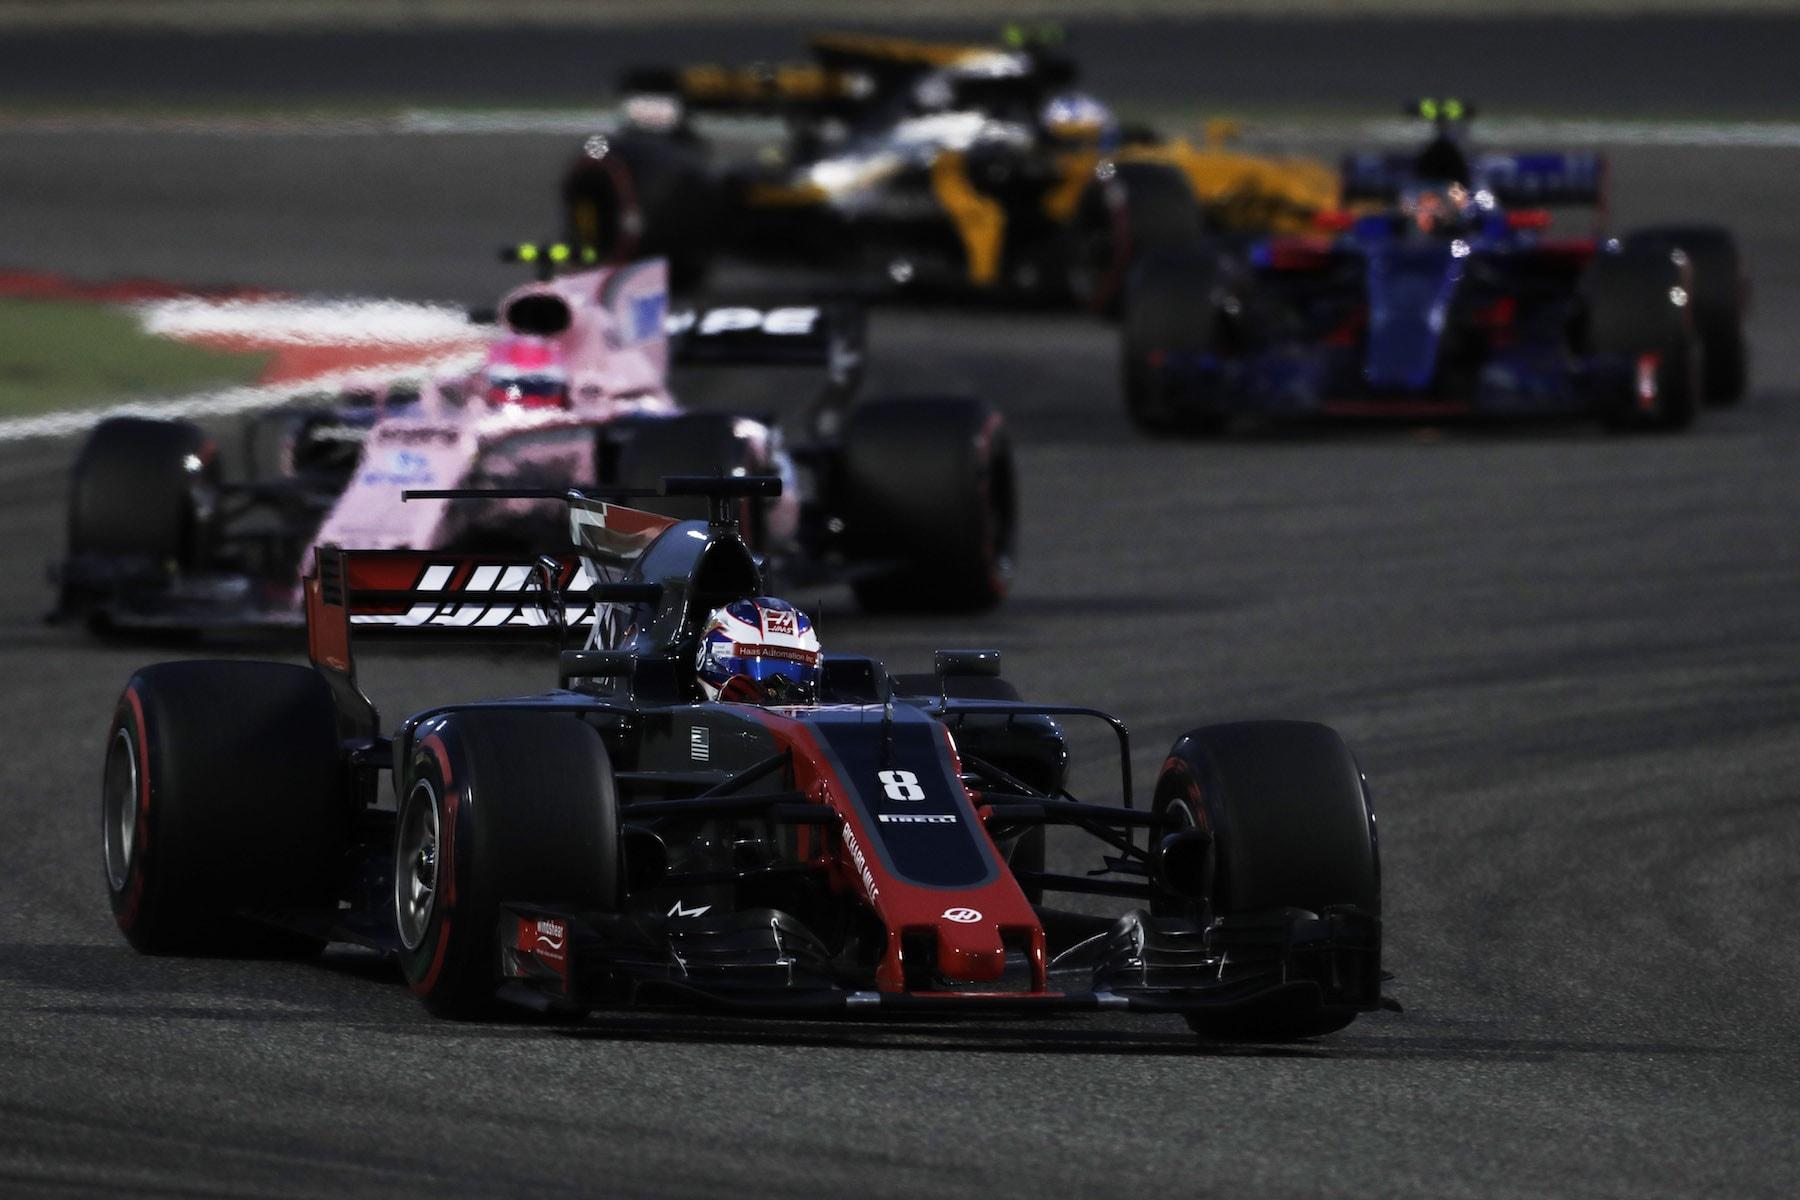 F 2017 Romain Grosjean   Haas VF17   2017 Bahrain GP P8 1 copy.jpg